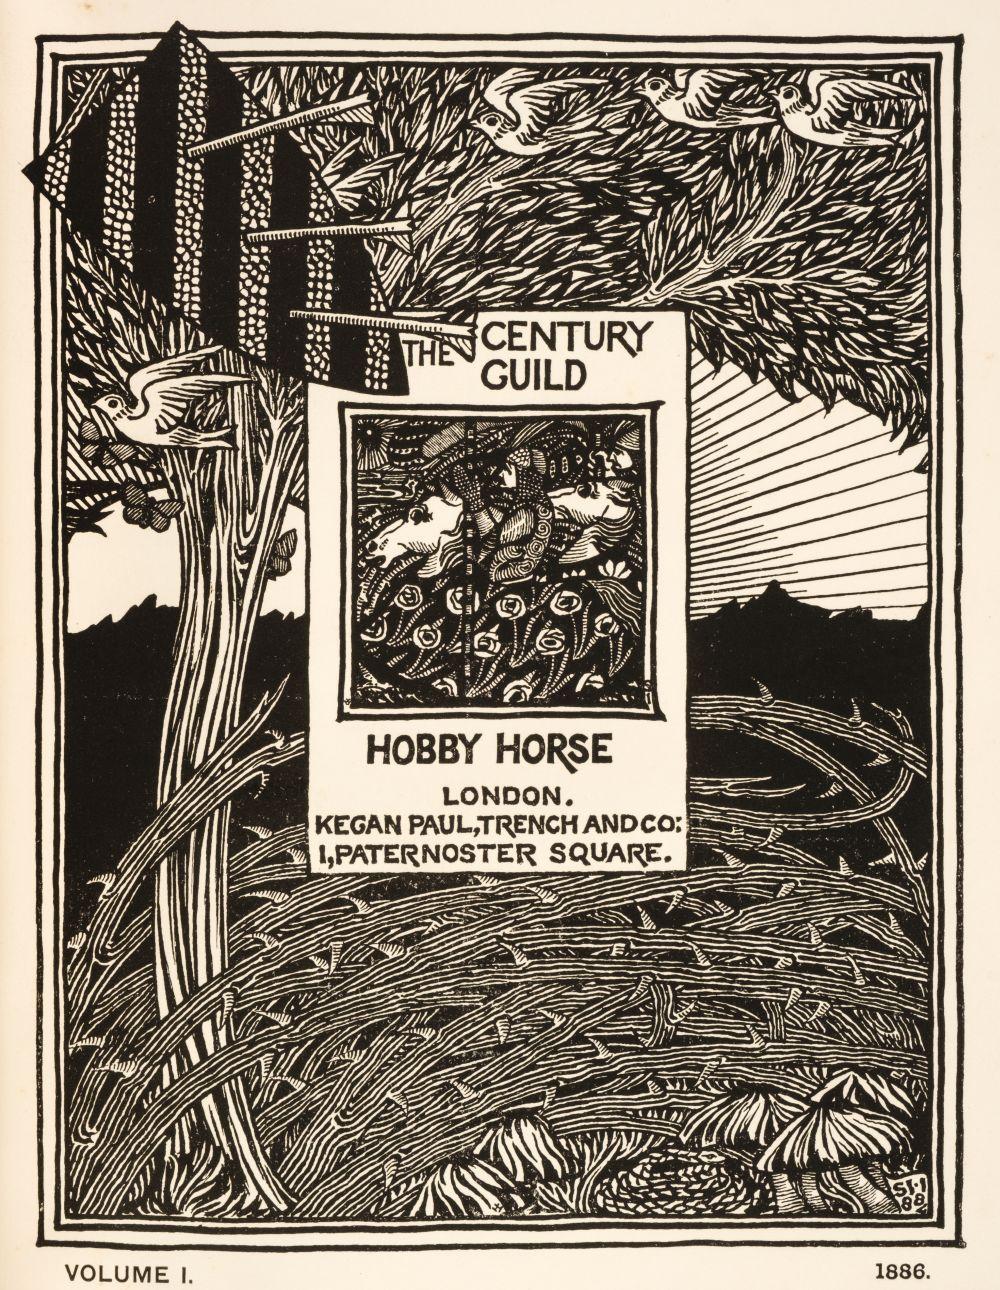 Mackmurdo (A.H., et al., editors). The Century Guild Hobby Horse, 7 vols...